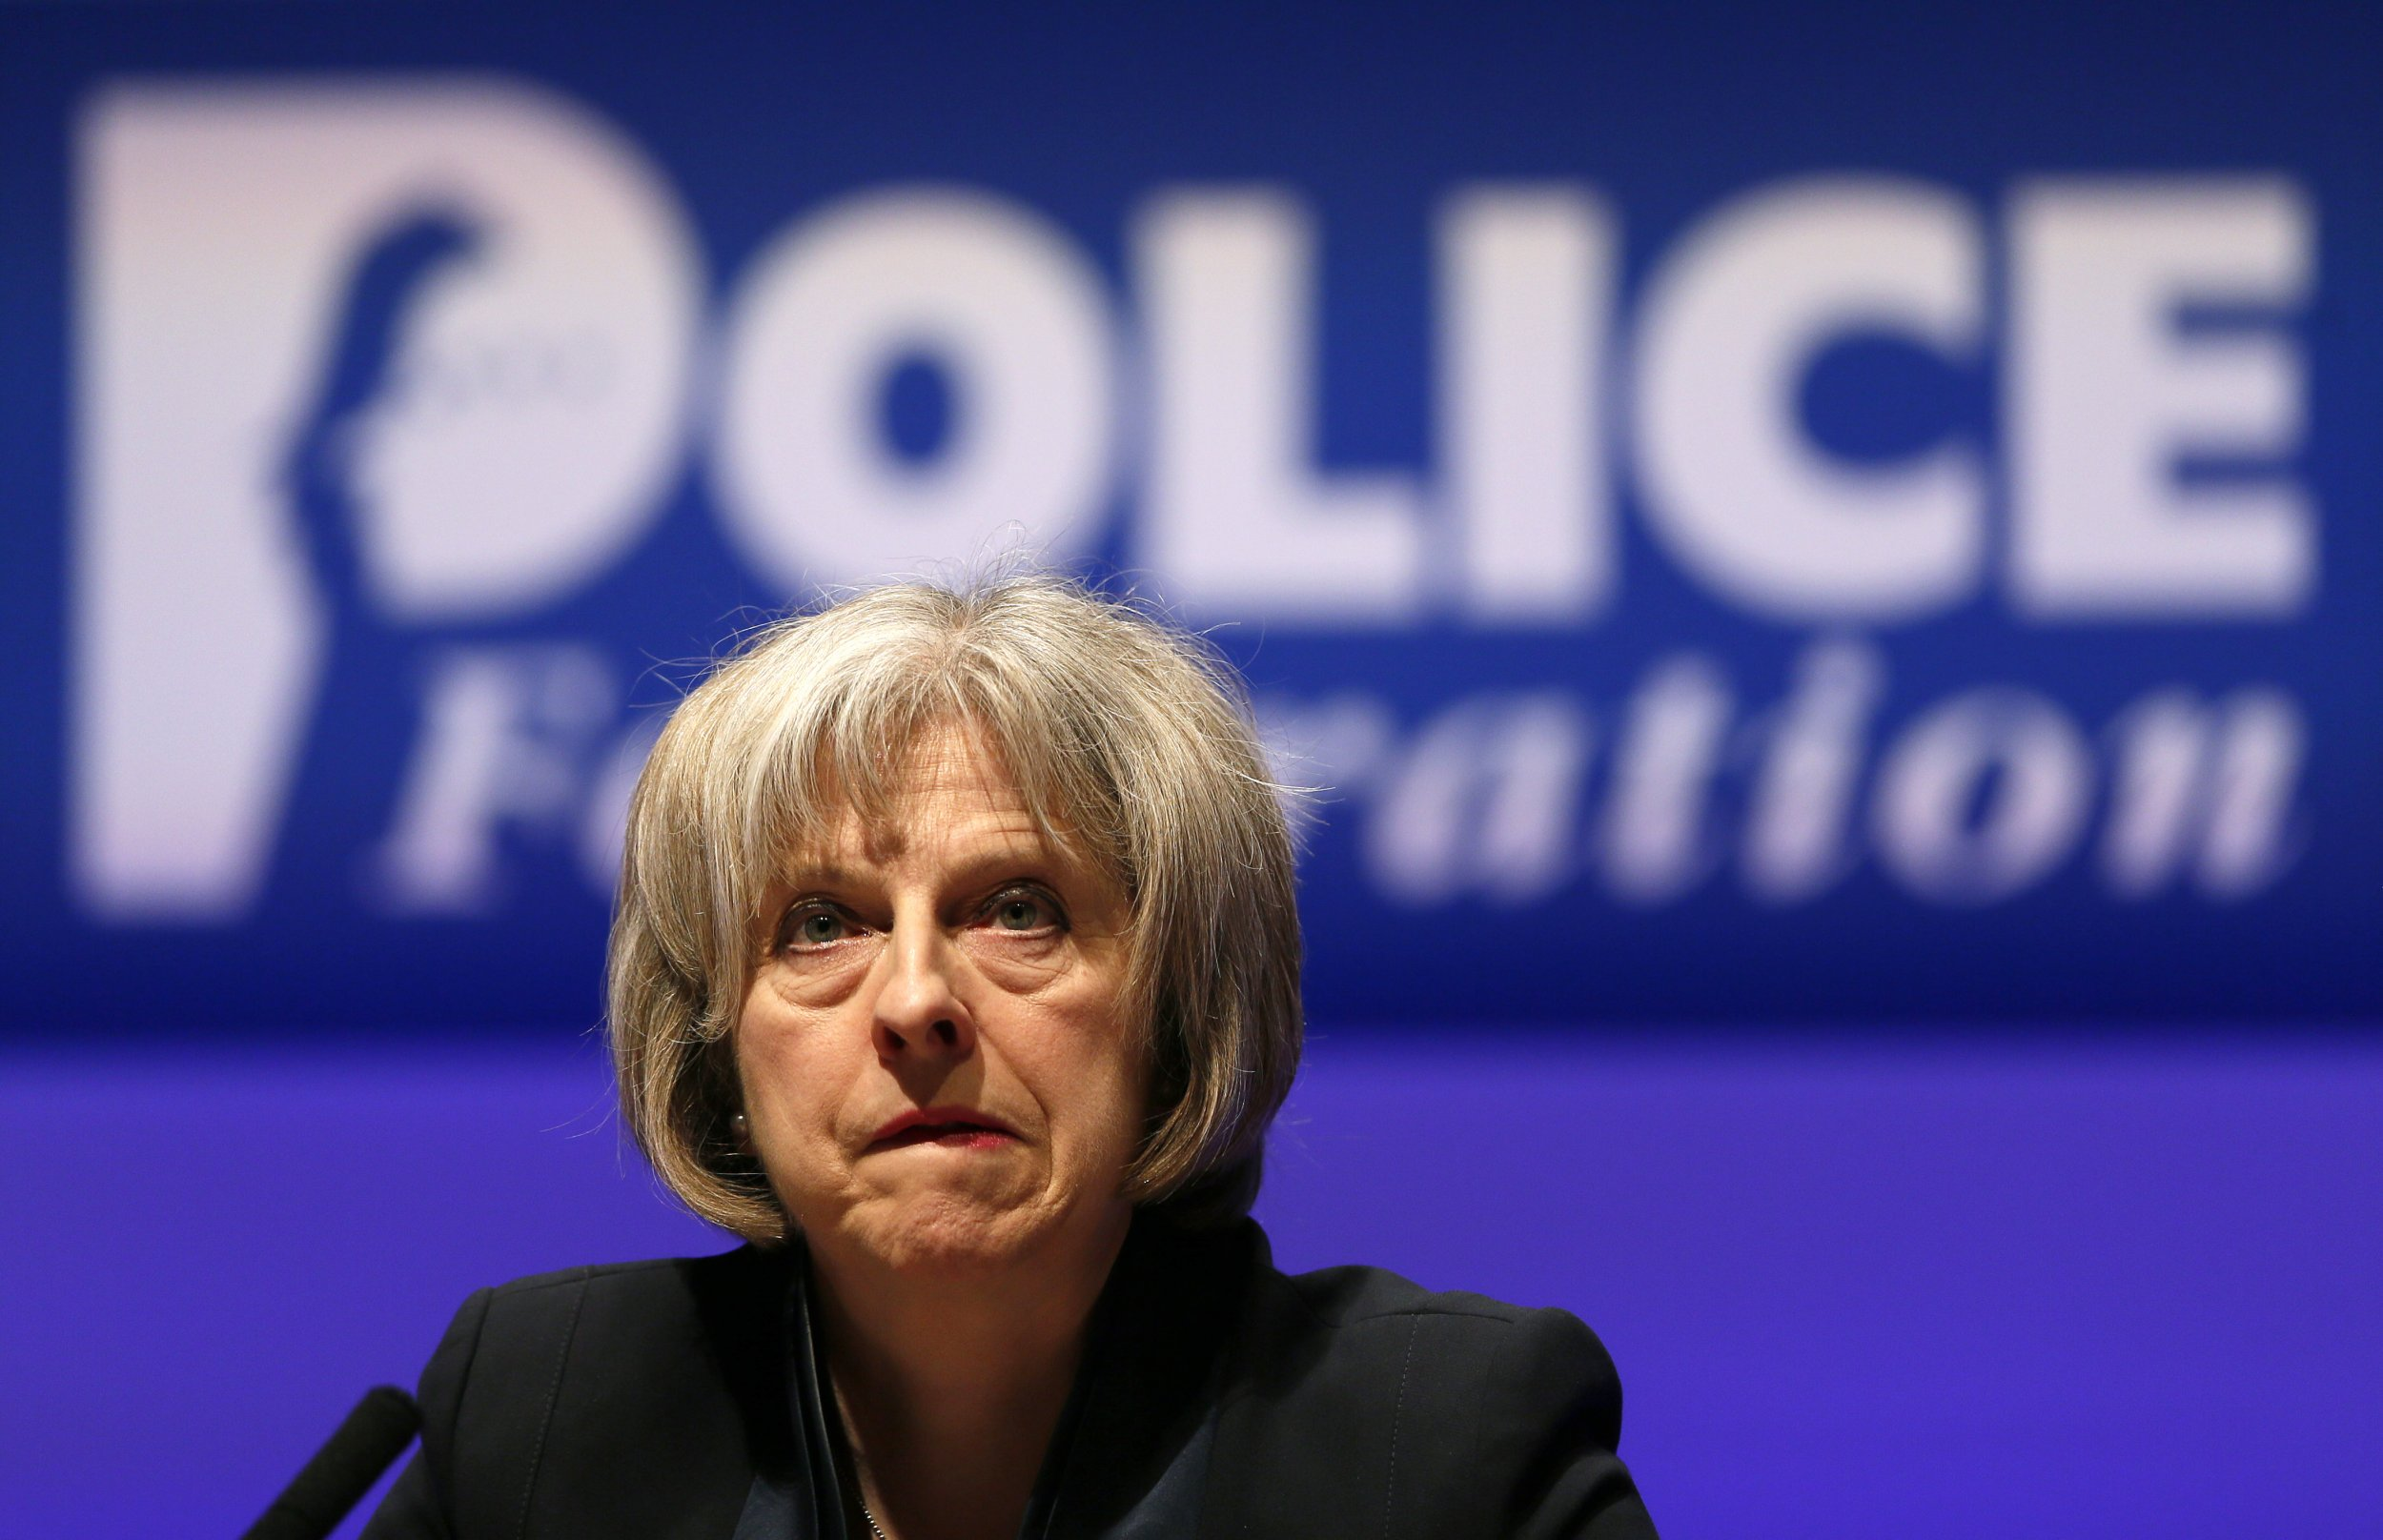 Theresa May police and counterterrorism funding cuts